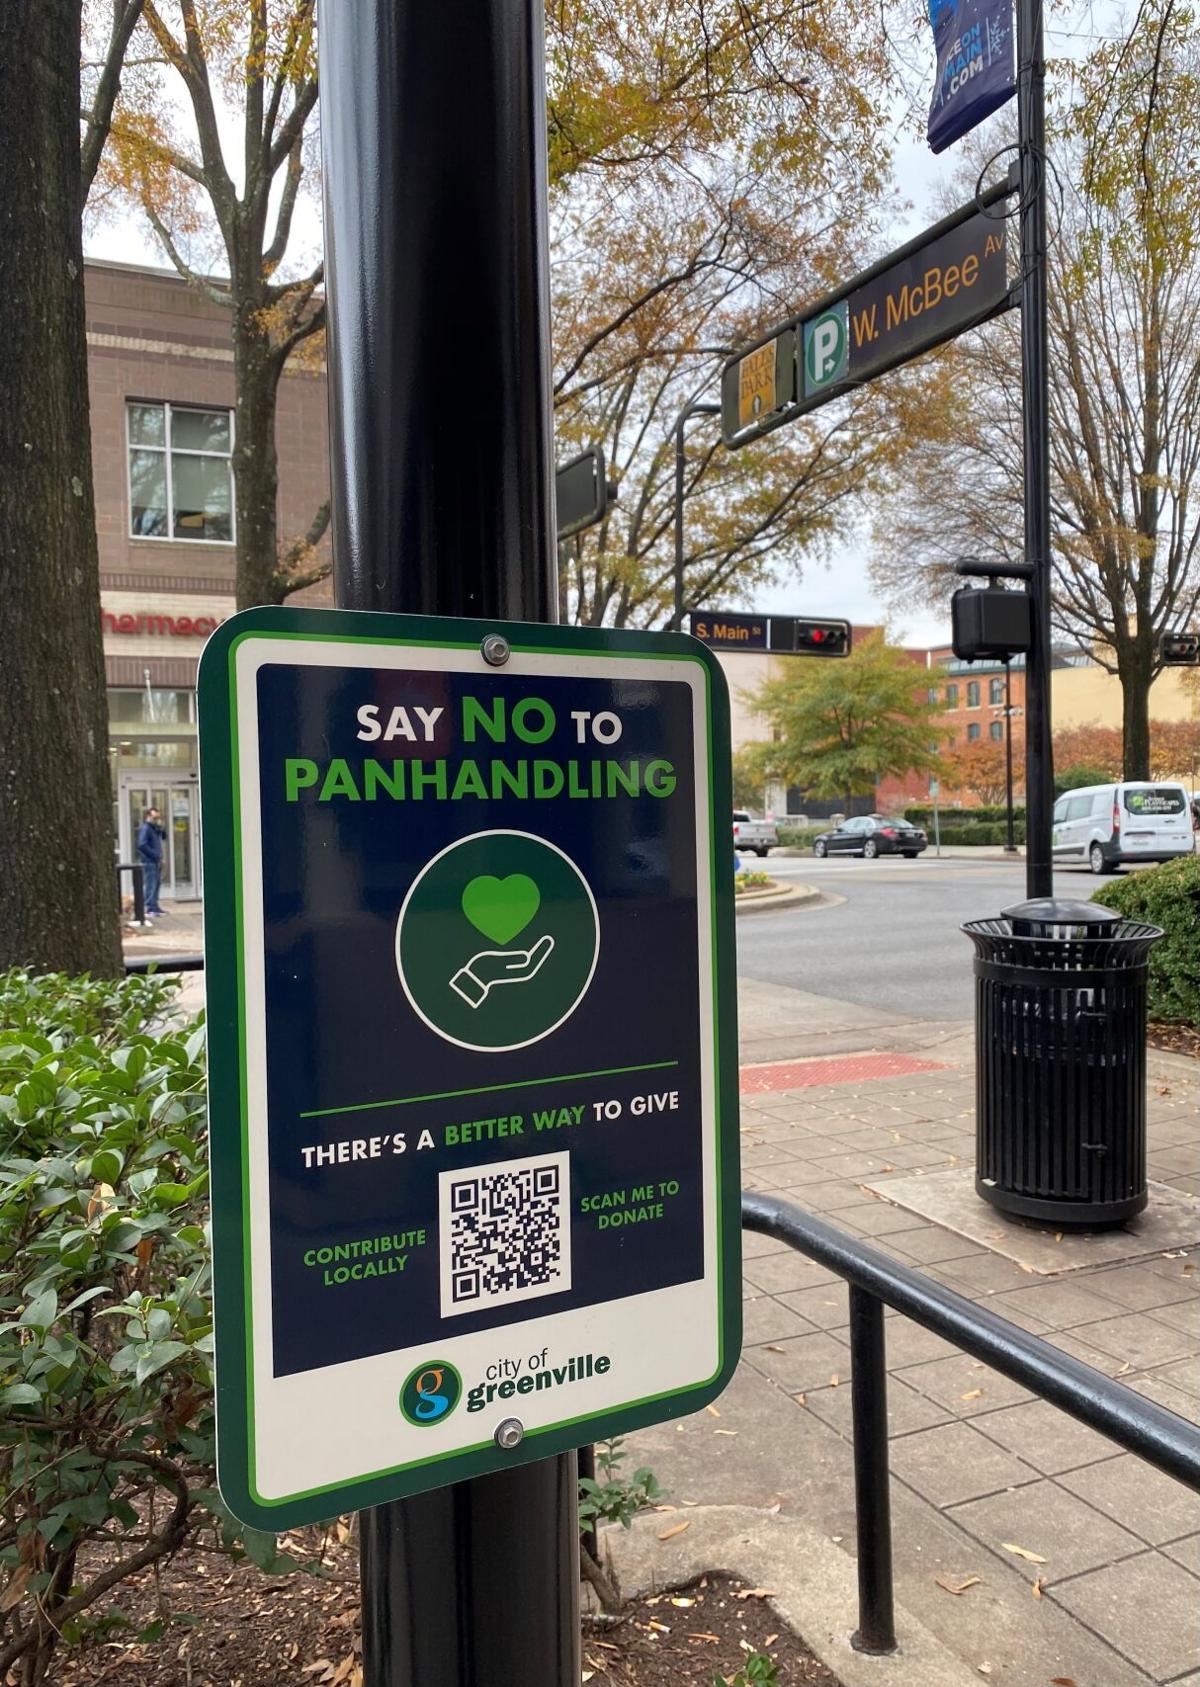 Anti-panhandling sign in downtown Greenville